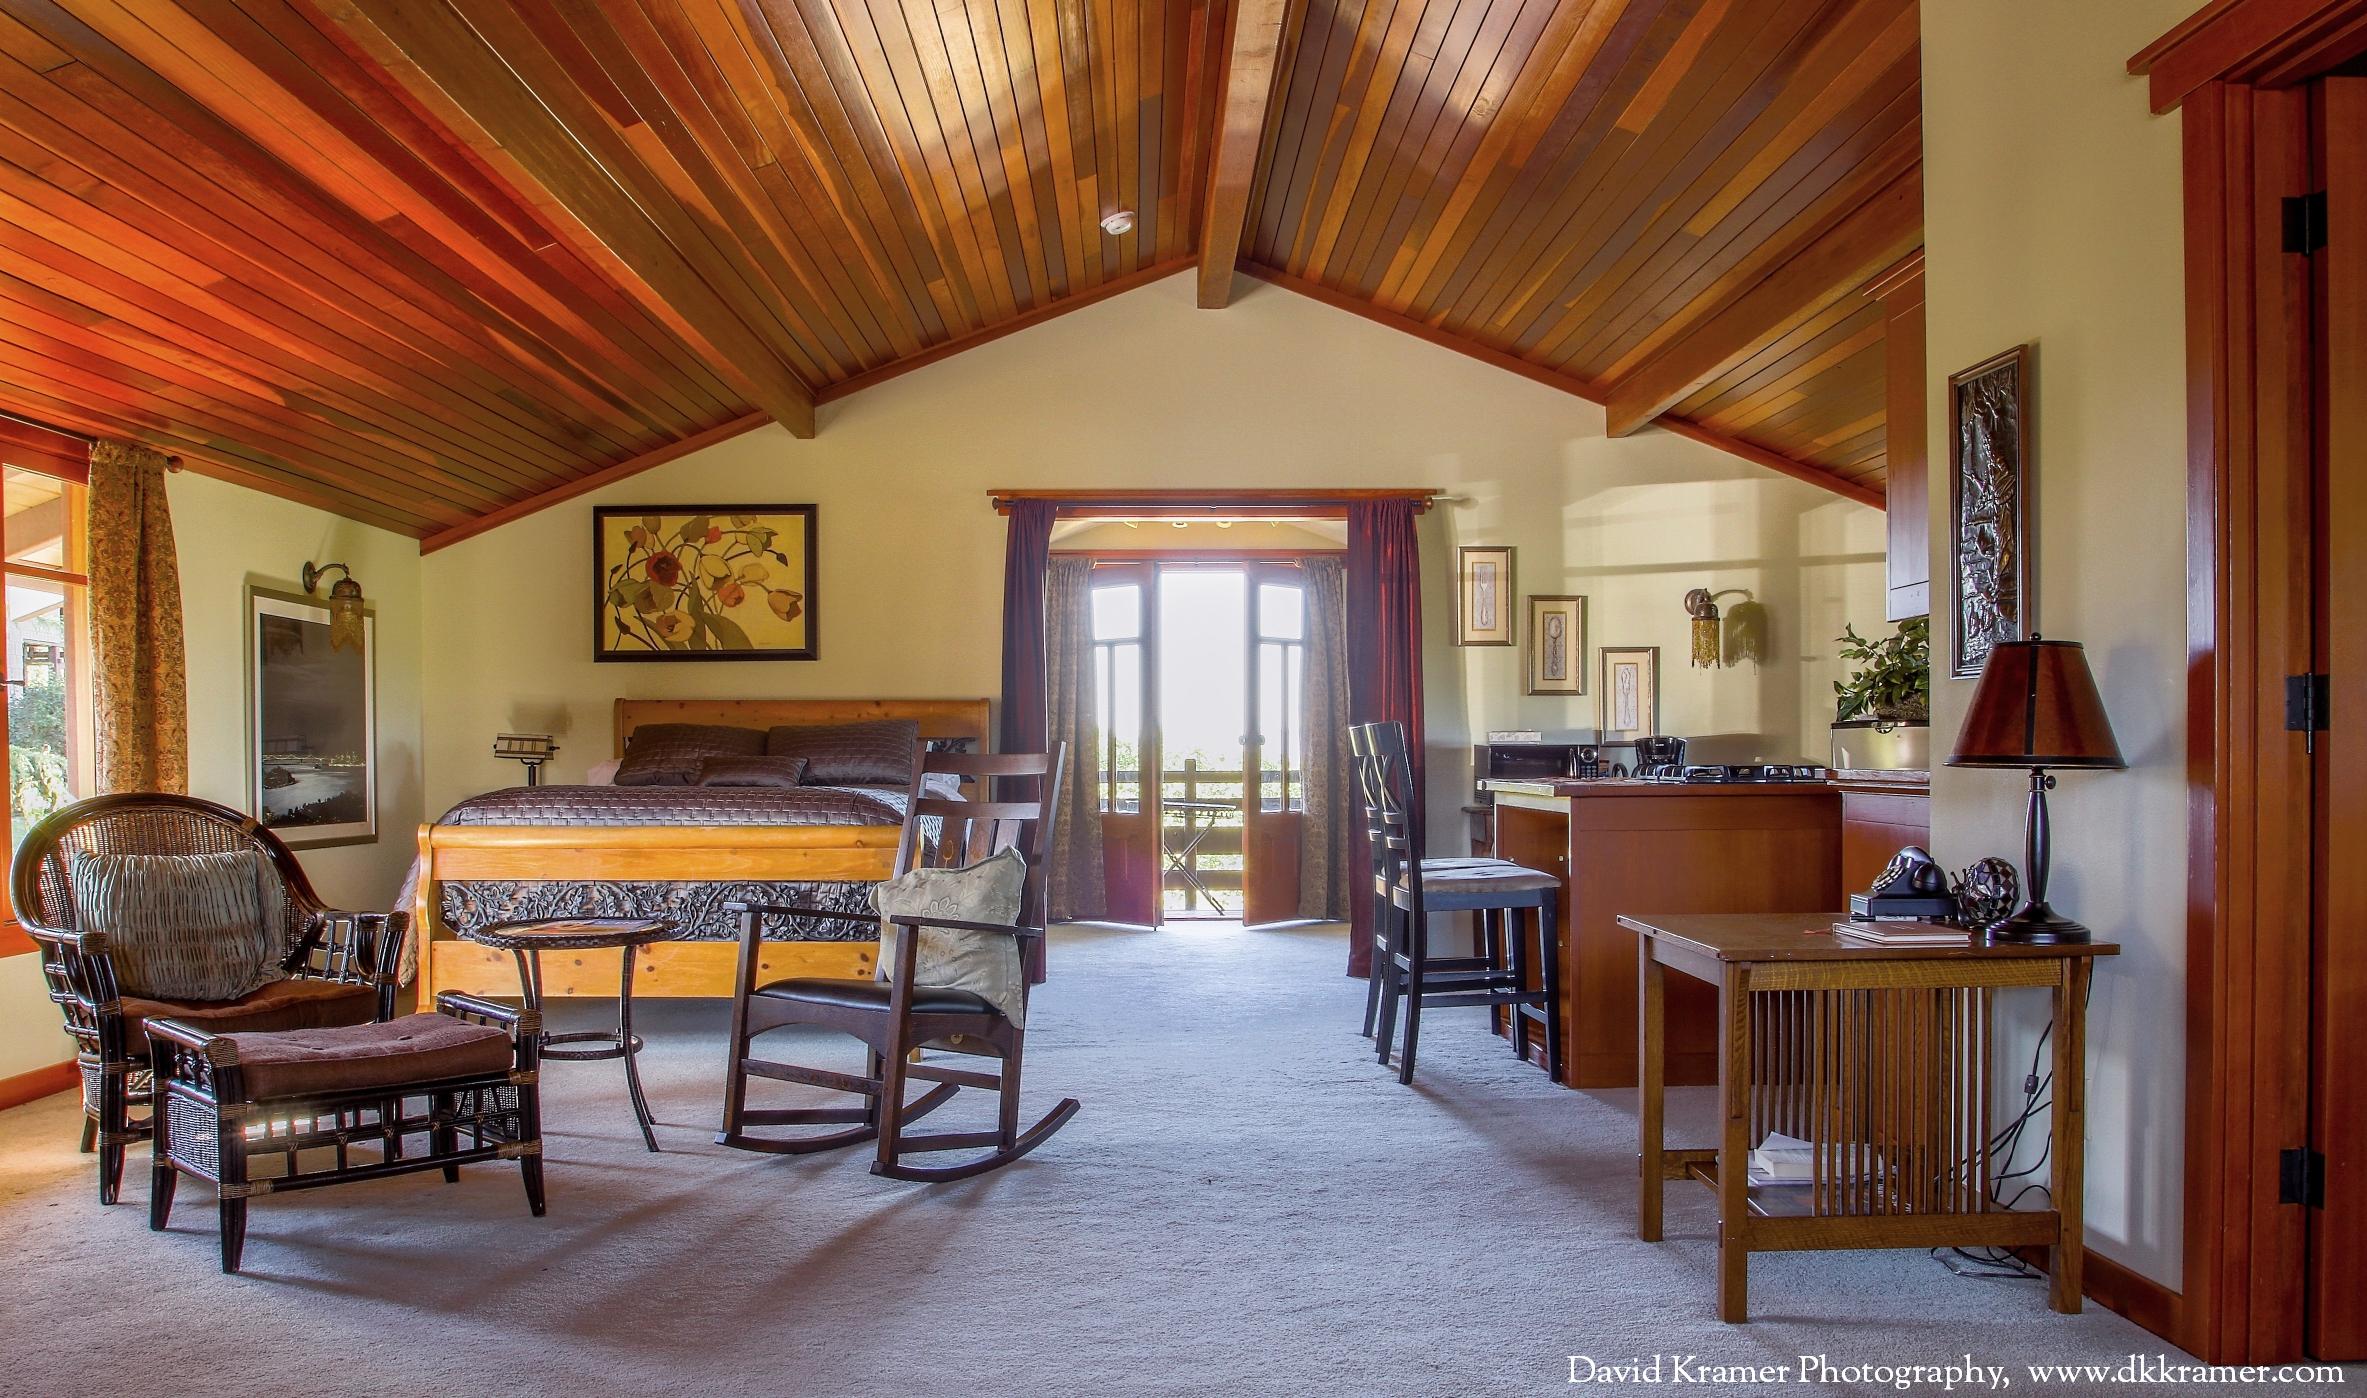 DKP - Lilac Guest House 05.jpg